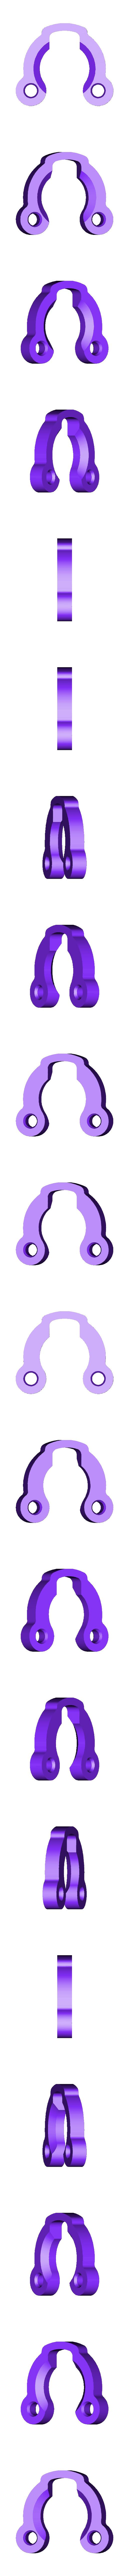 Seager.stl Download STL file Shape Shaker_Caterpillar • Design to 3D print, Ocrobus